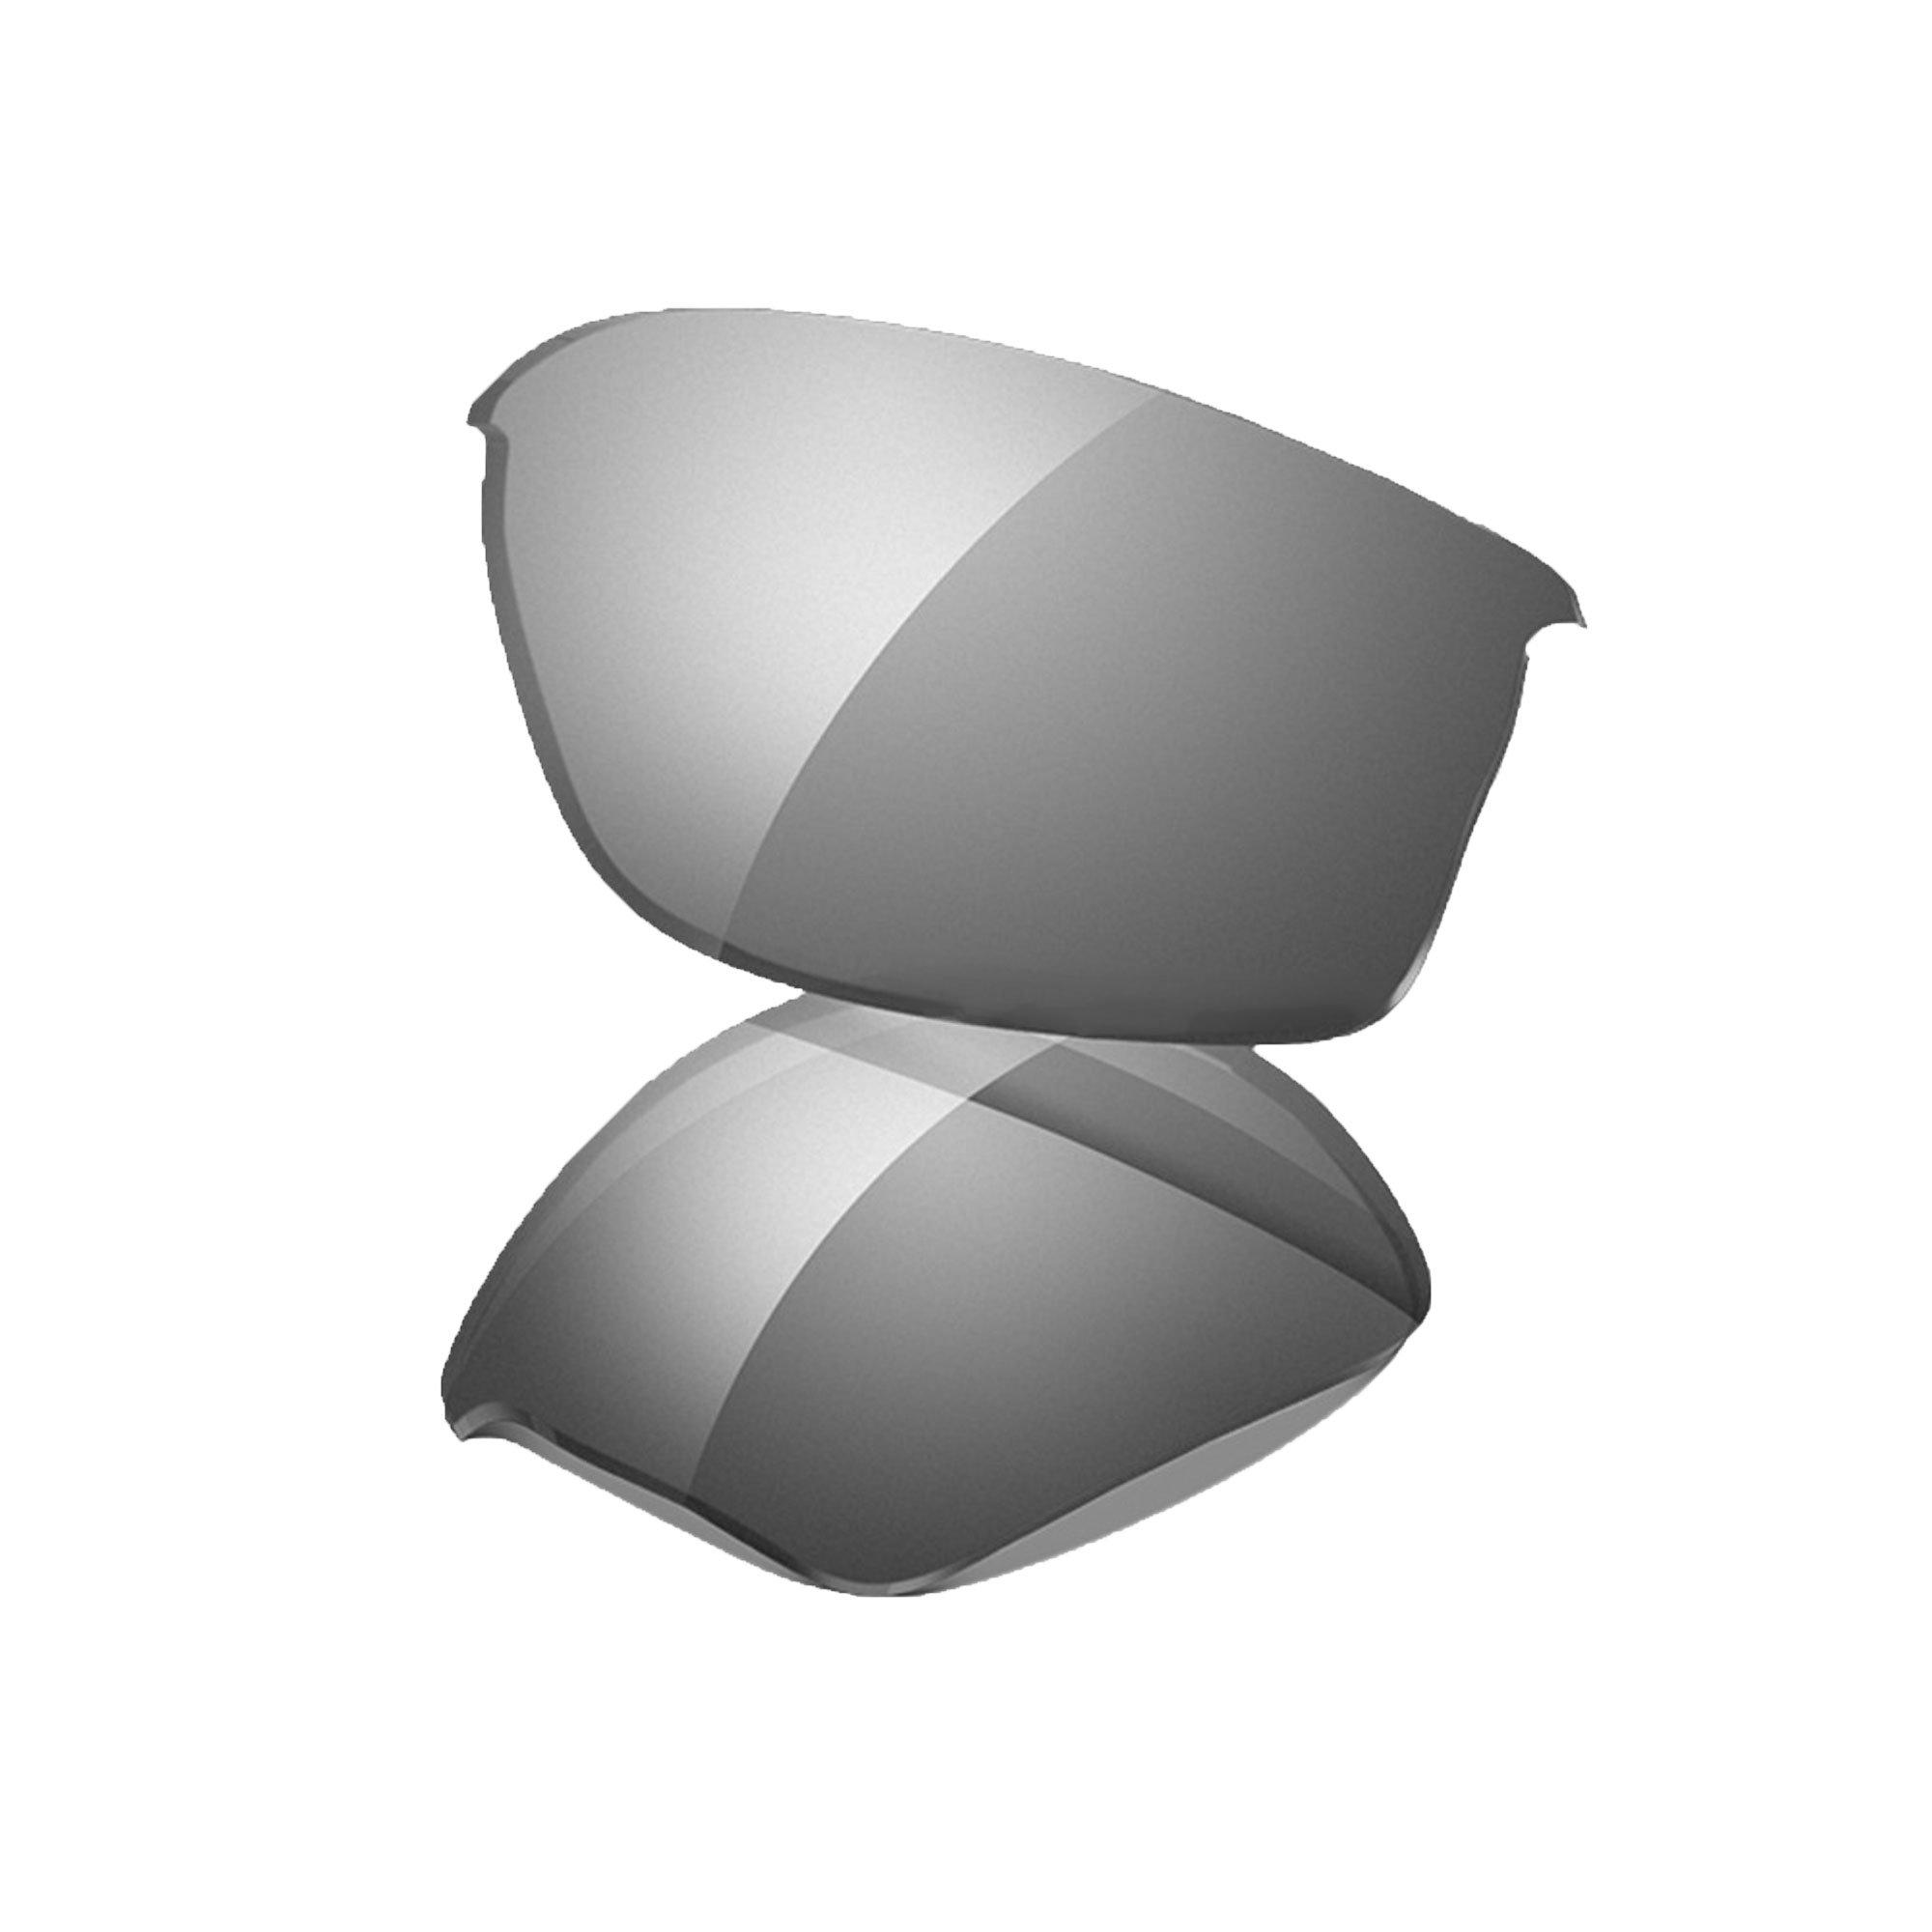 Oakley Flak 2.0 XL Replacement Lens Black Iridium, One Size by Oakley